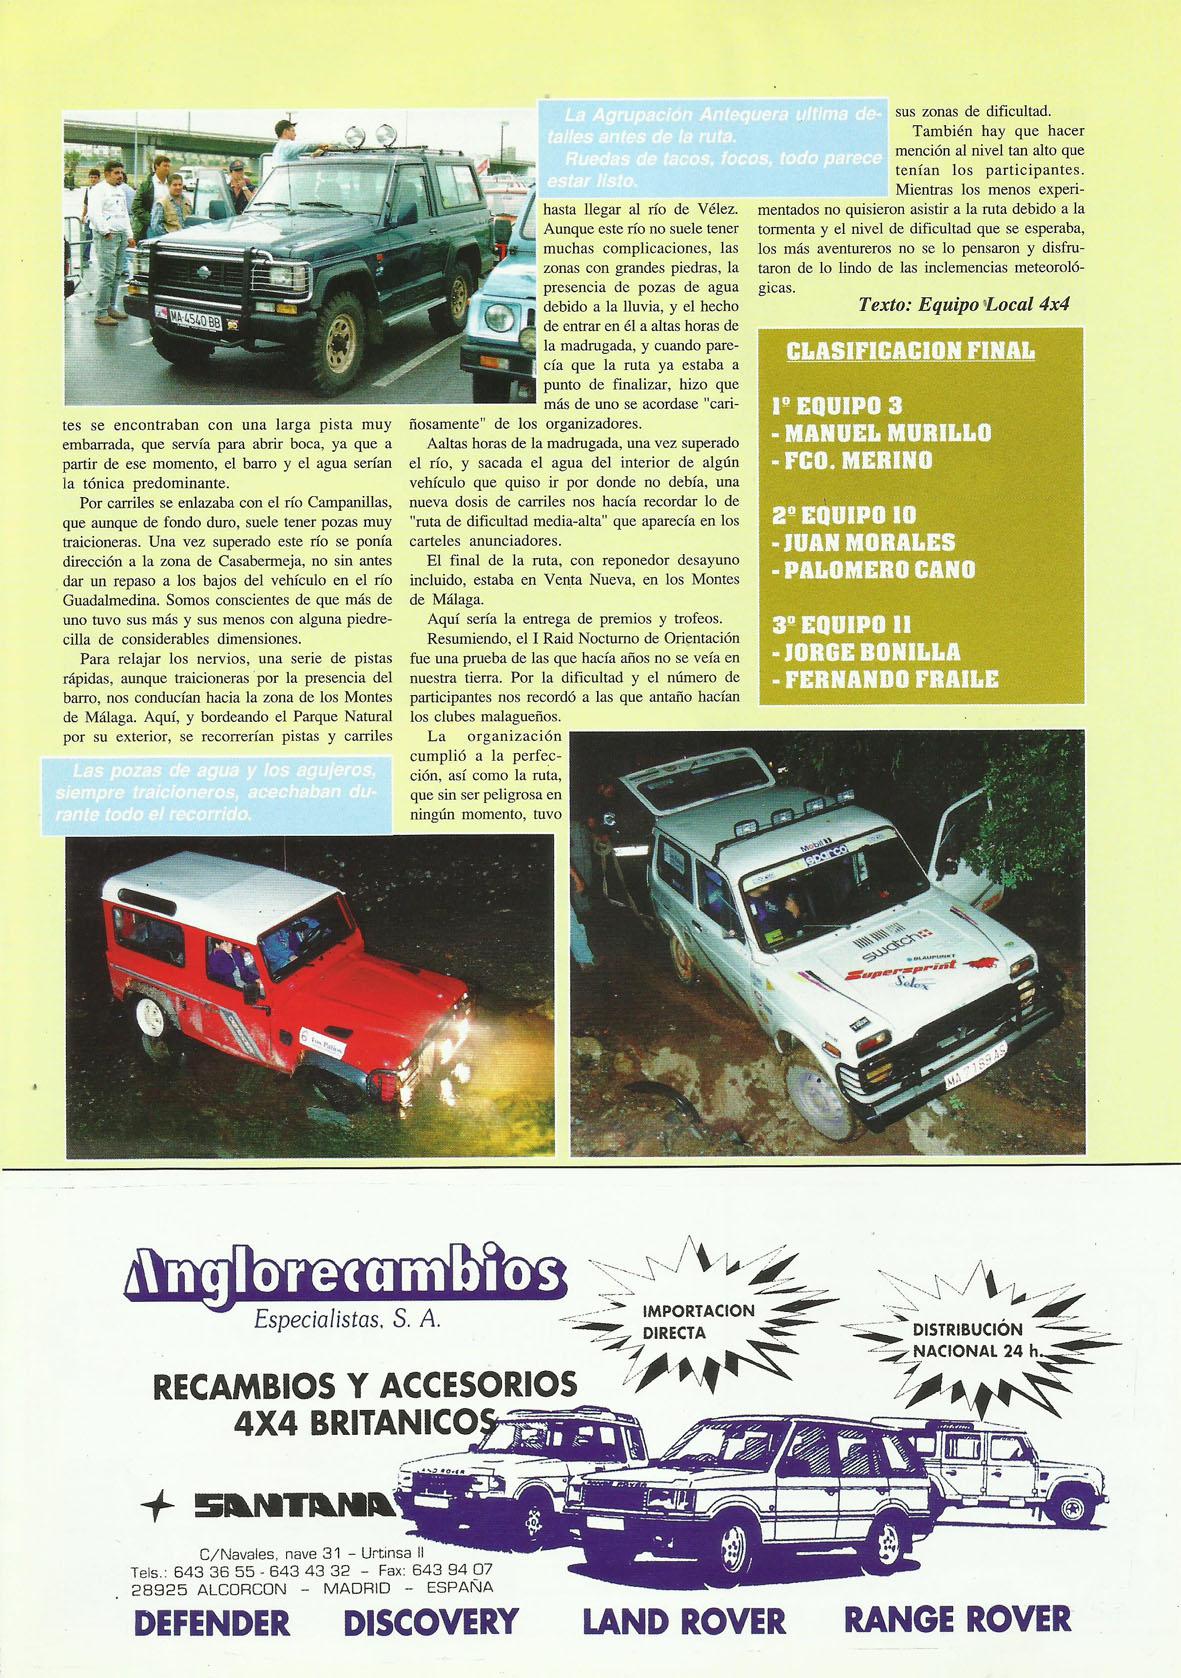 Revista Local 4x4 32 37 Actividades Realizadas I Rally Nocturno de Orientación